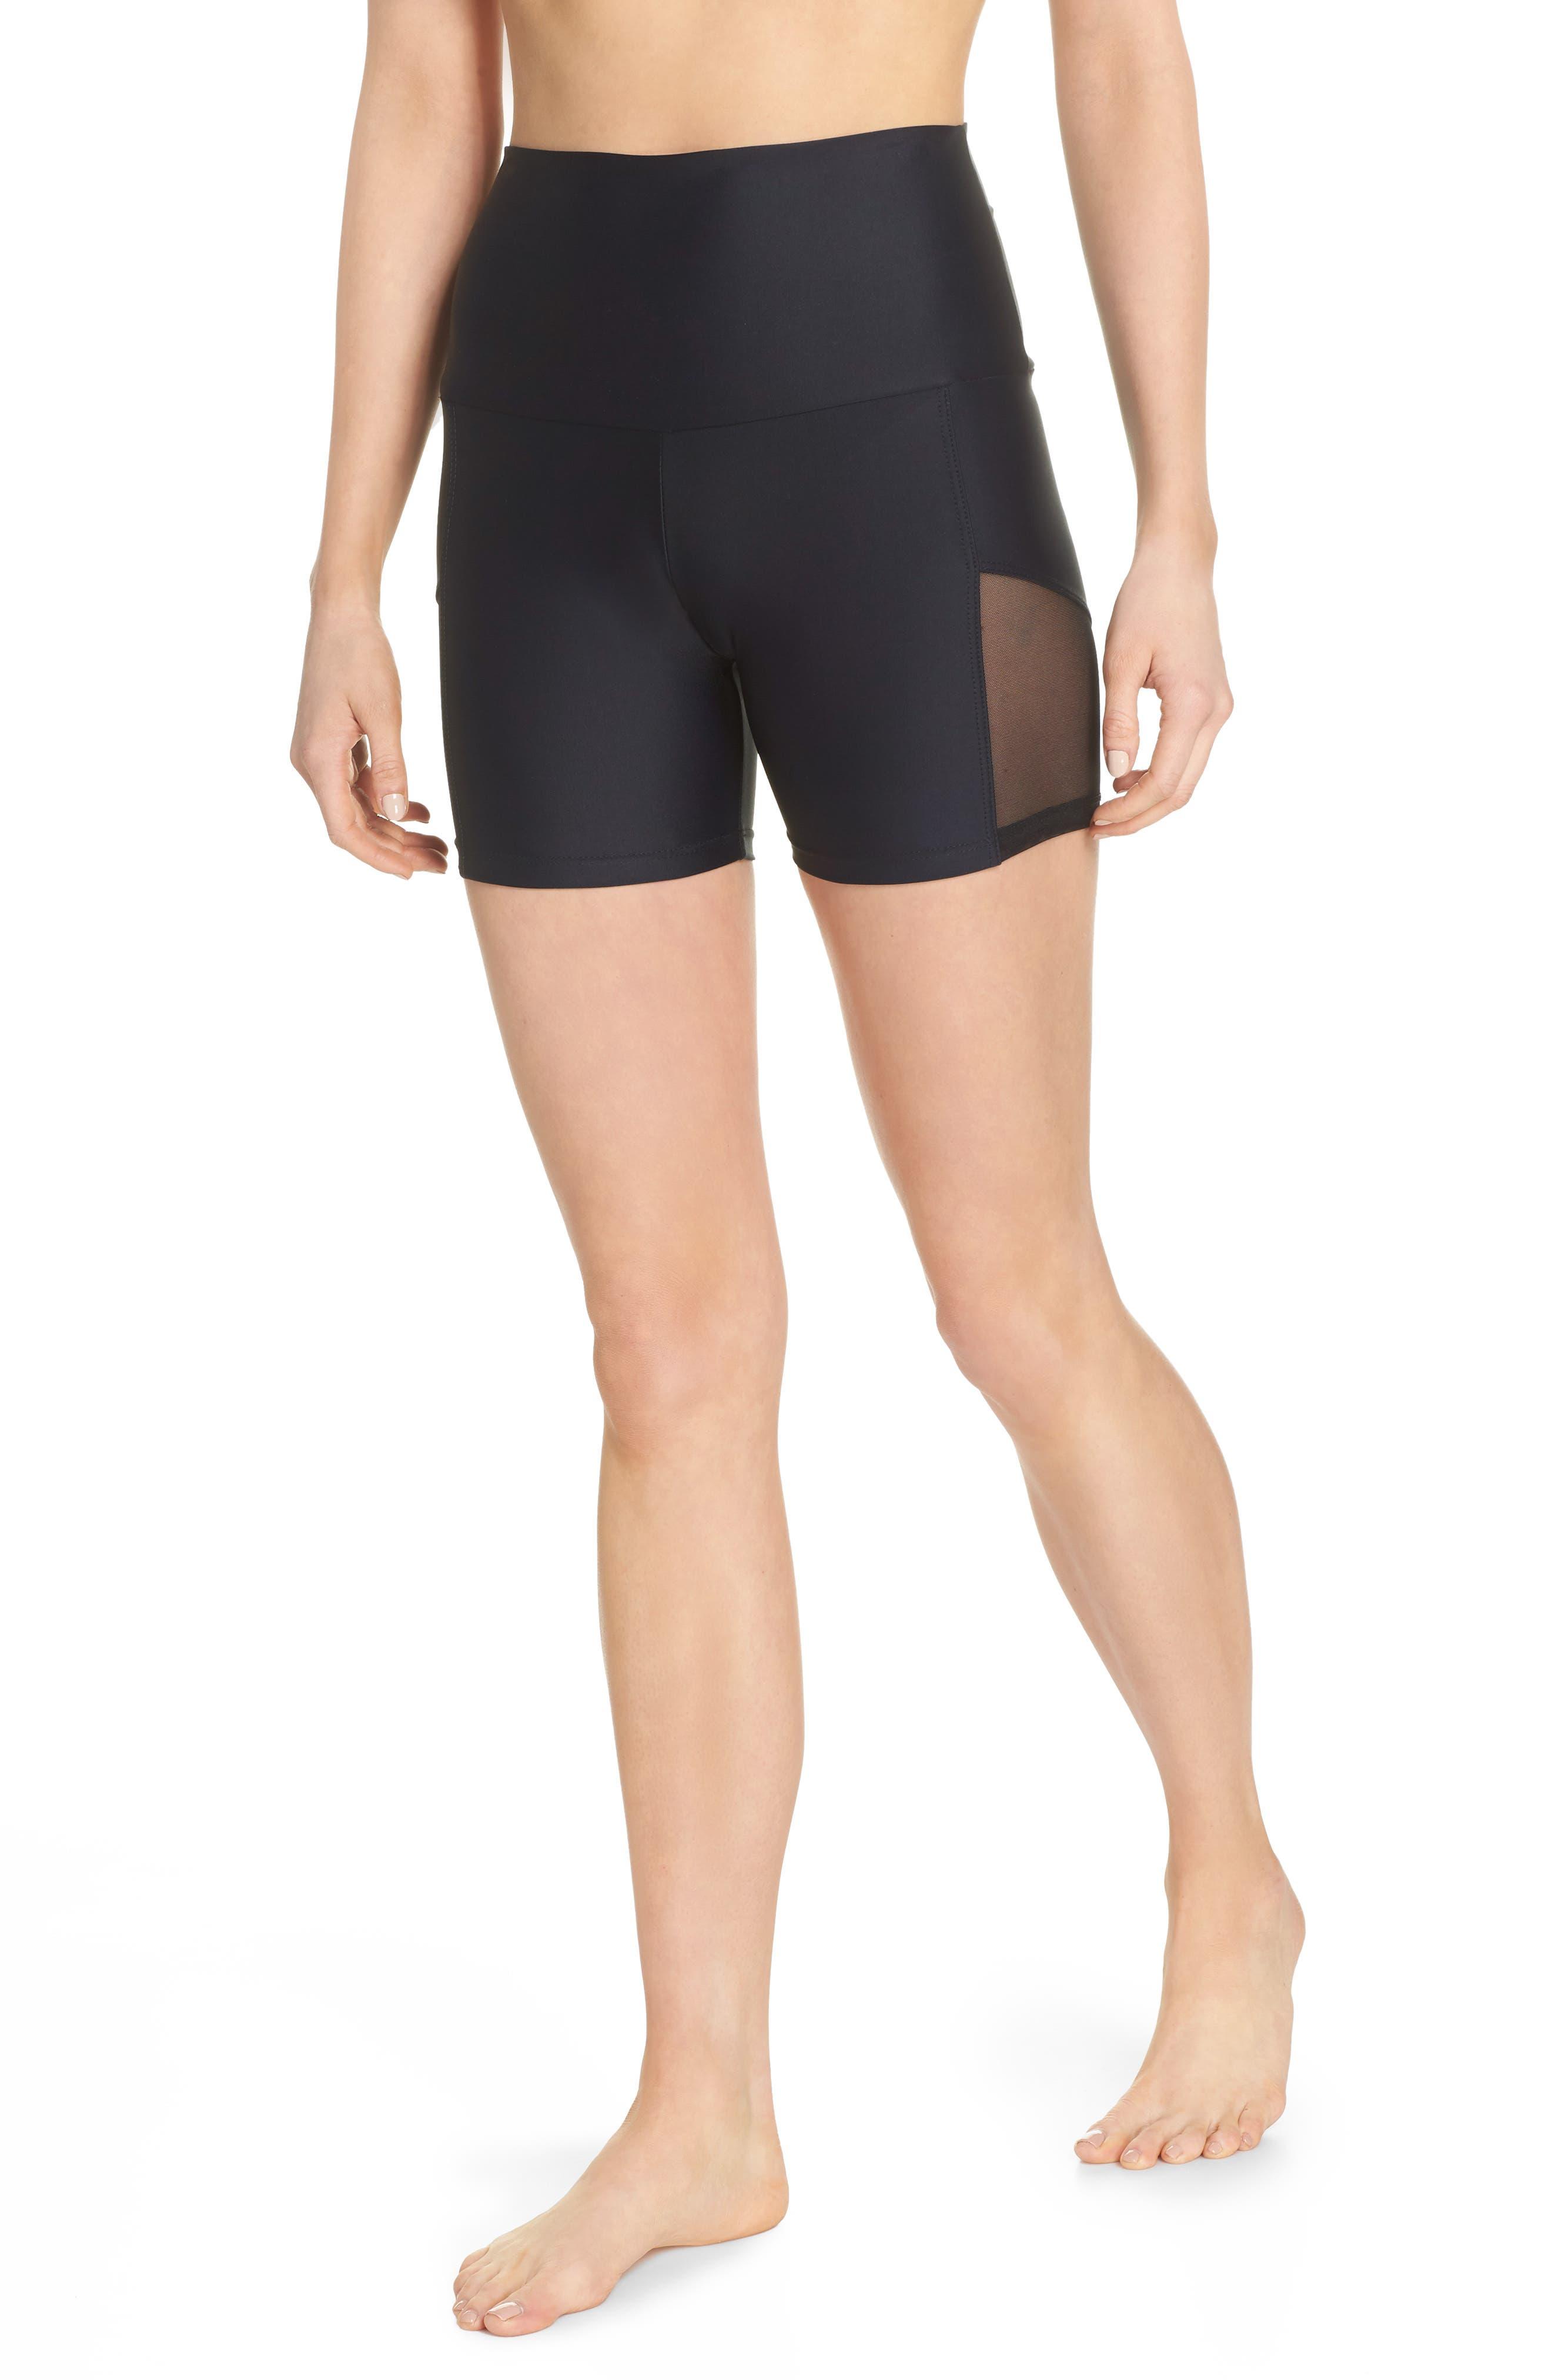 Stunner Shorts,                         Main,                         color, Black